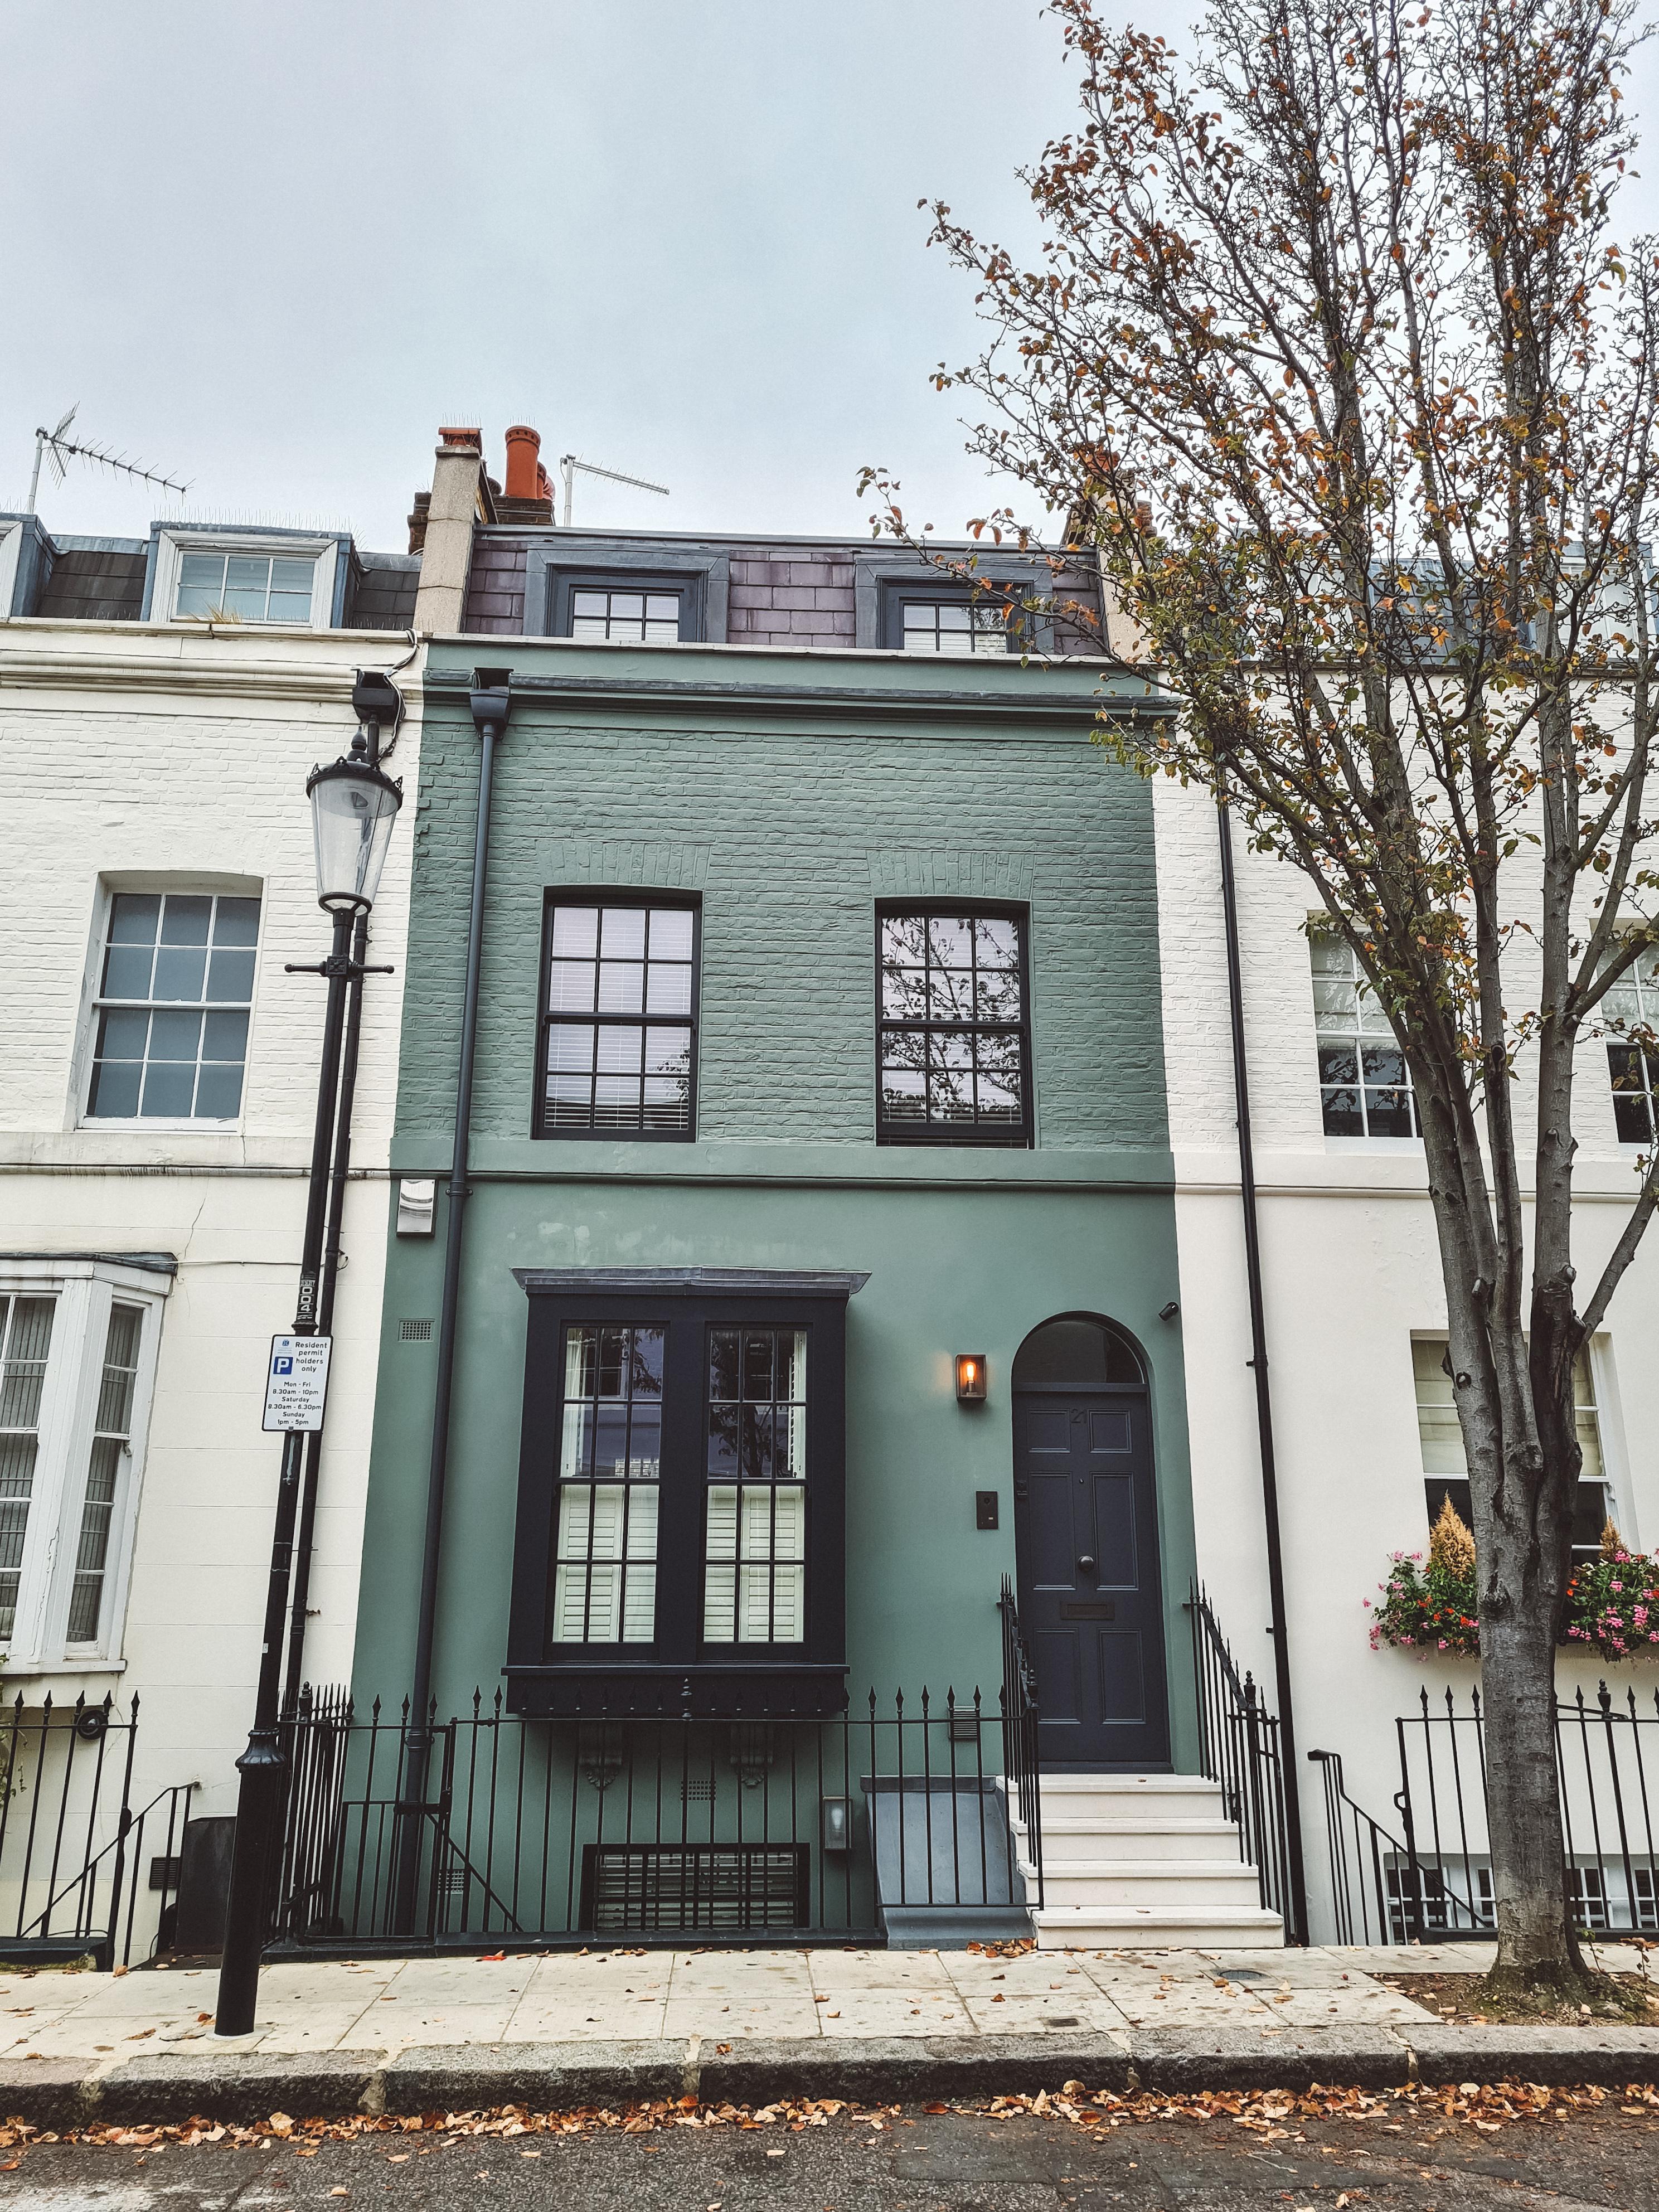 Green house, Markham Street